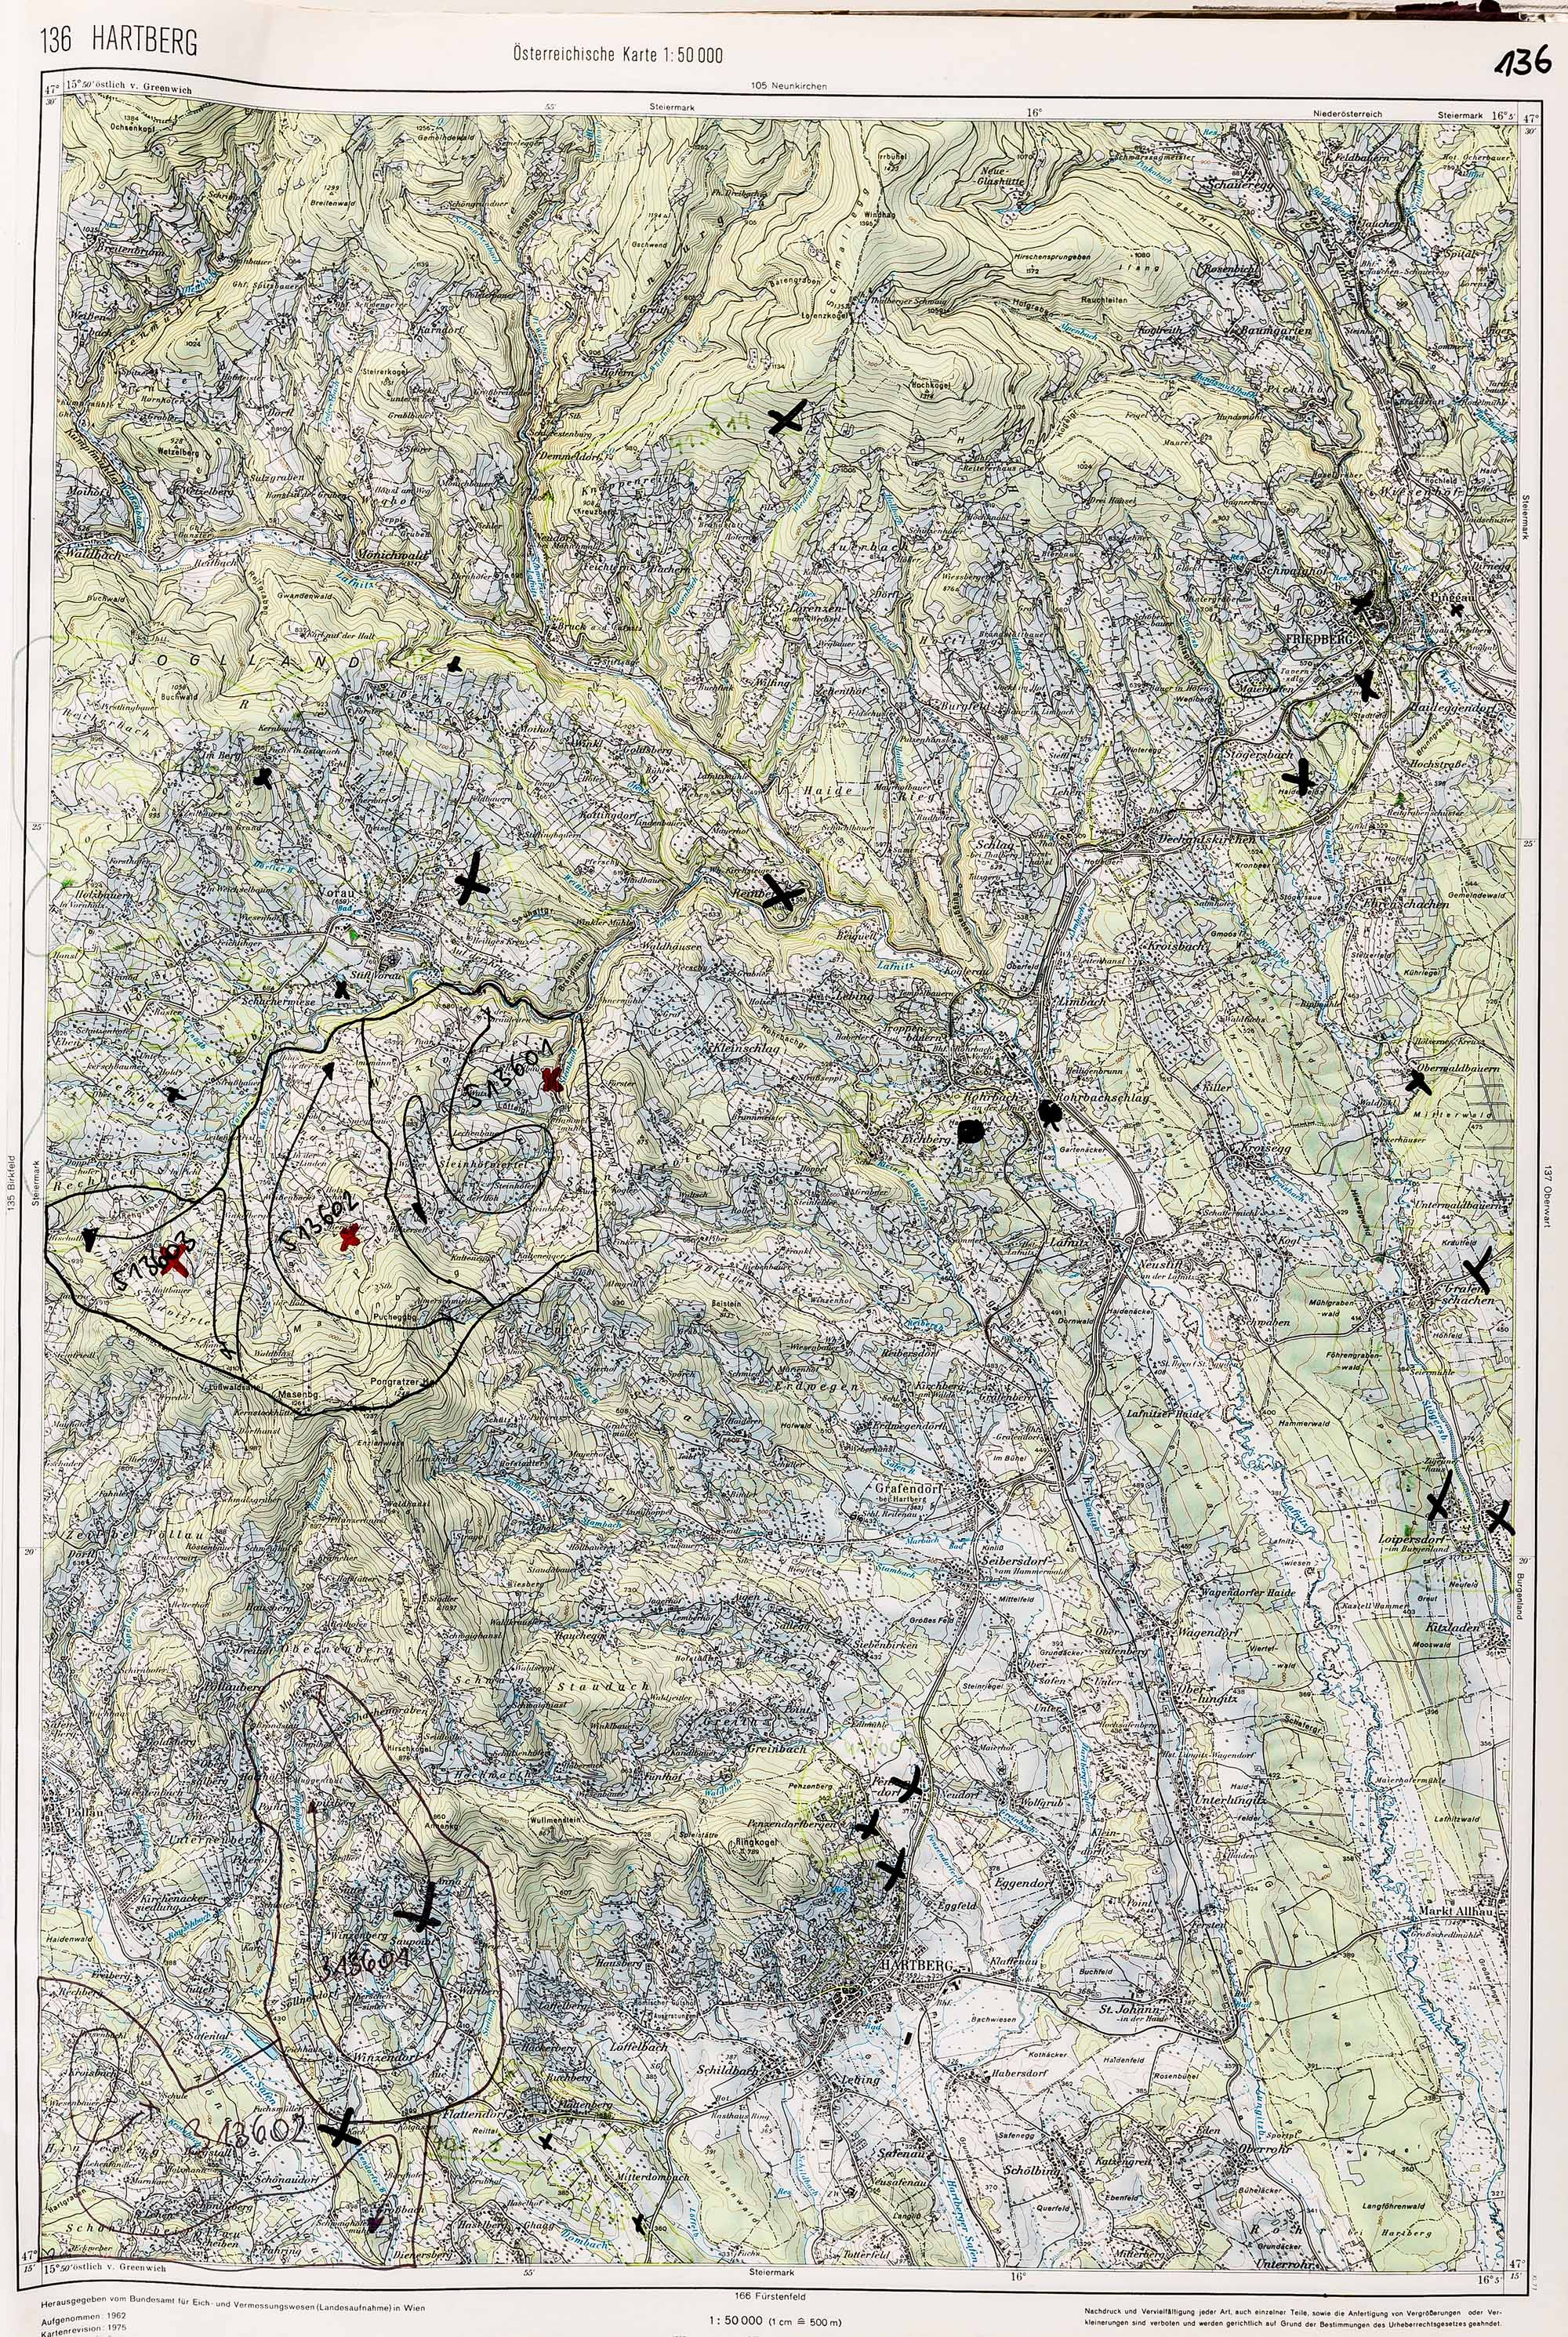 1983-1986 Karte 136